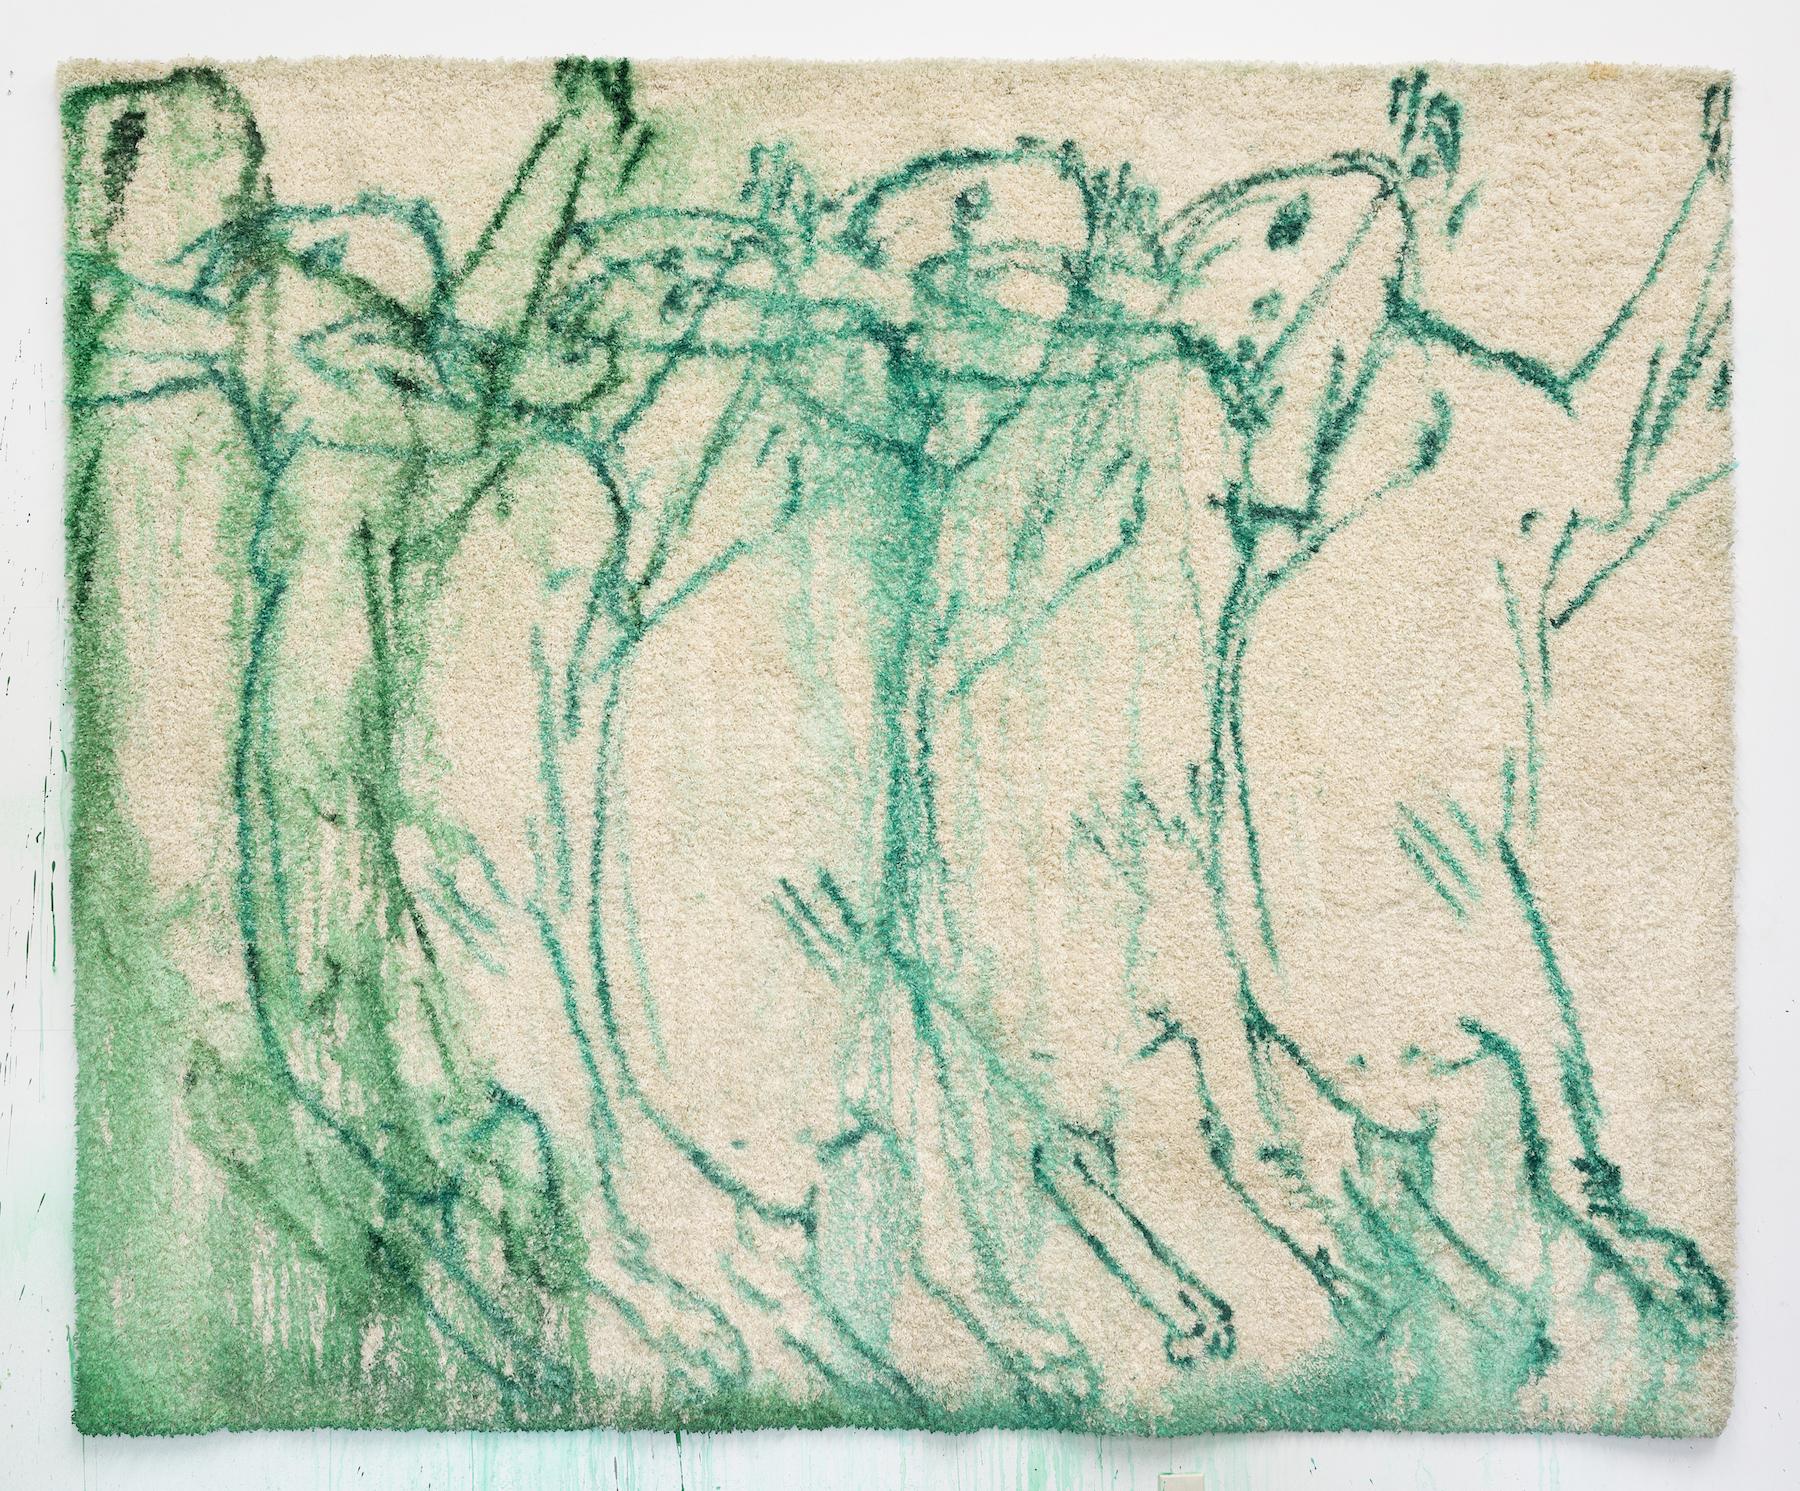 Brook Hsu 'Grasshopper', 2021, ink on carpet, 243.8 x 304.8 cm. Photo: Stephen Faught, Courtesy the artist; Kraupa - Tuskany Zeidler, Berlin